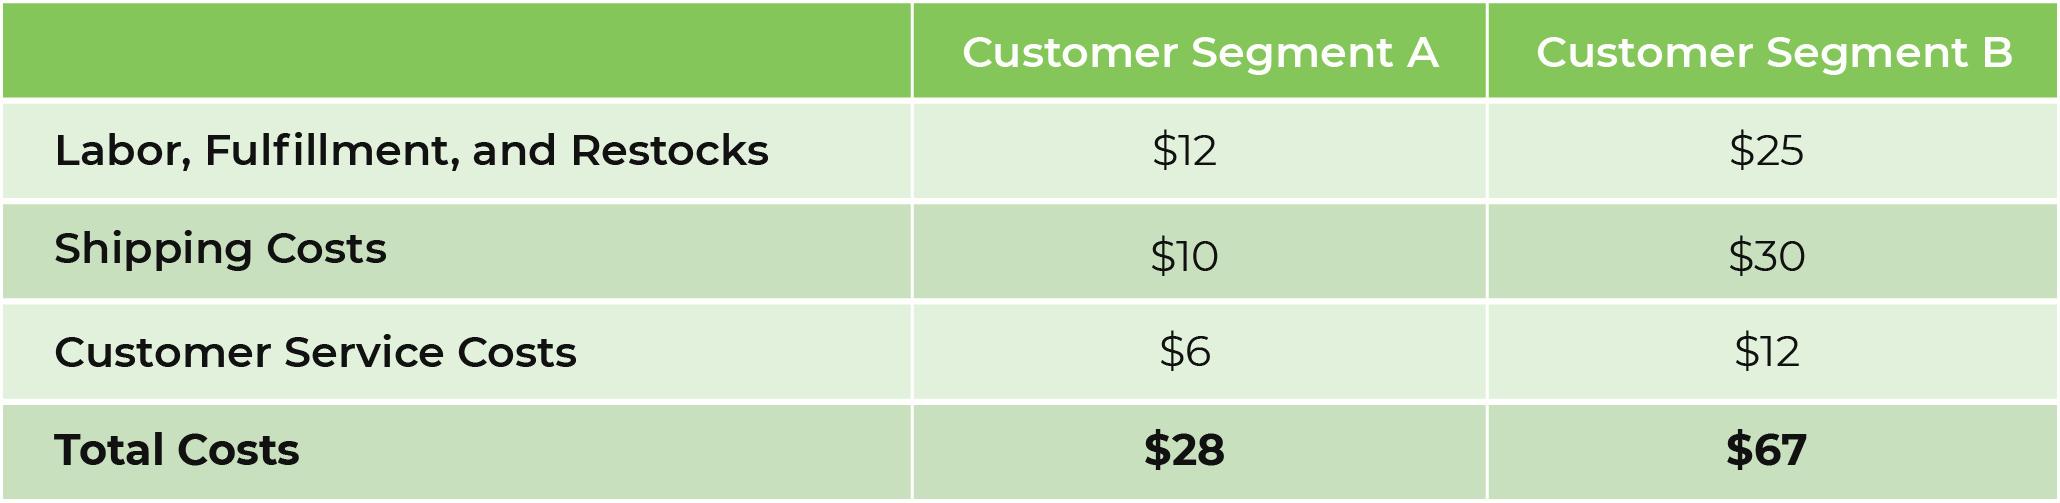 customer profitability analysis table about customer segment costs